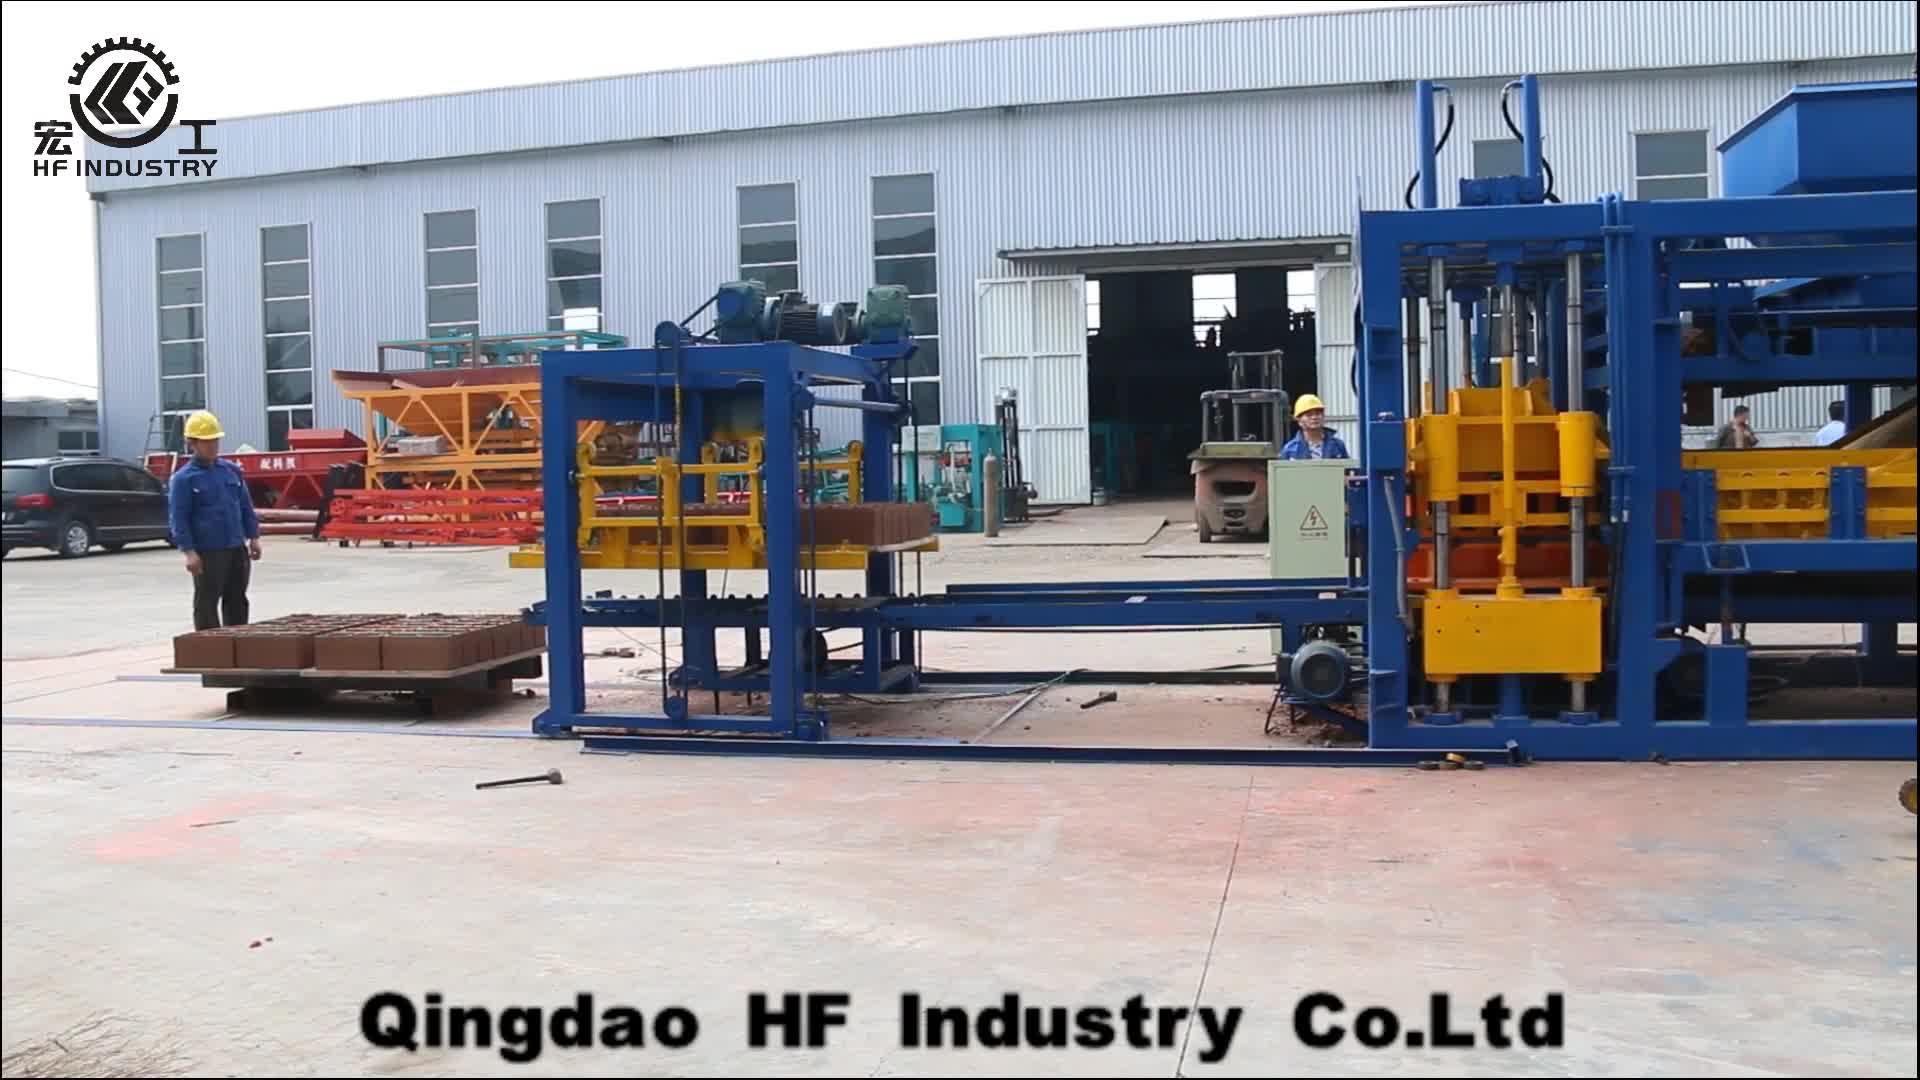 QT10-15 high quality full automatic concrete cement hollow block brick interlock paver making machine price in India